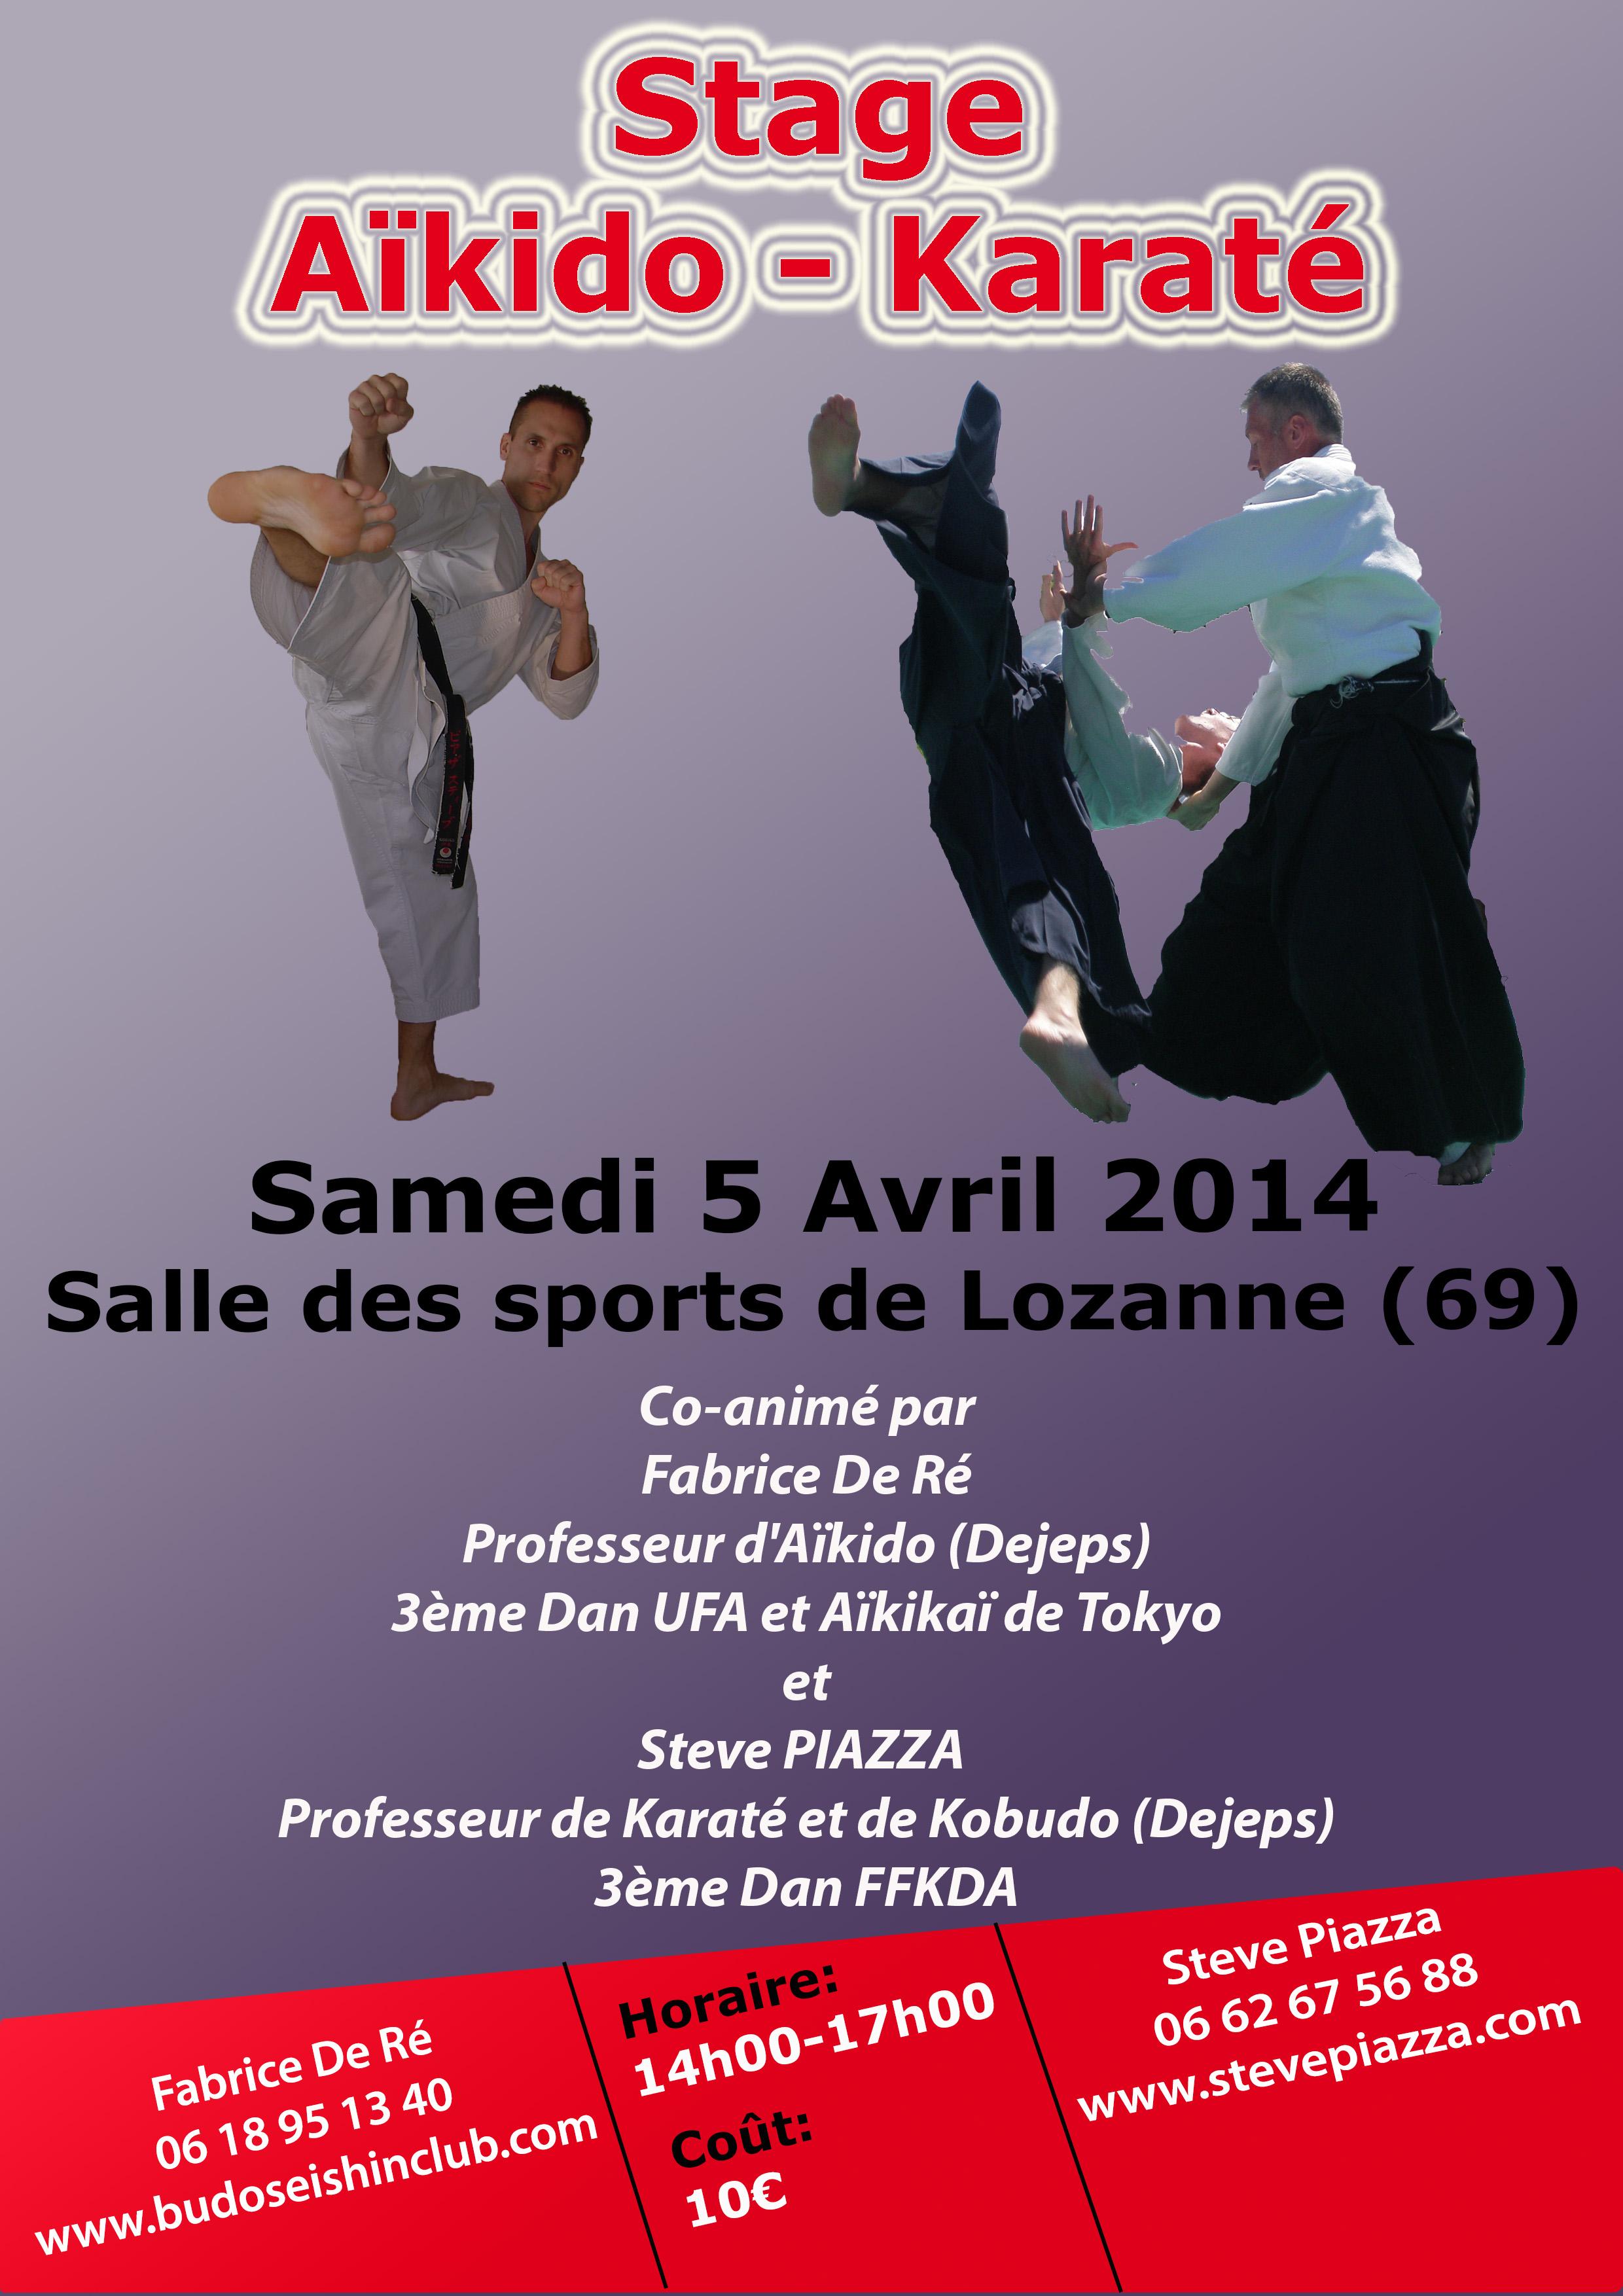 Stage Aïkido-Karaté le samedi 5 avril 2014